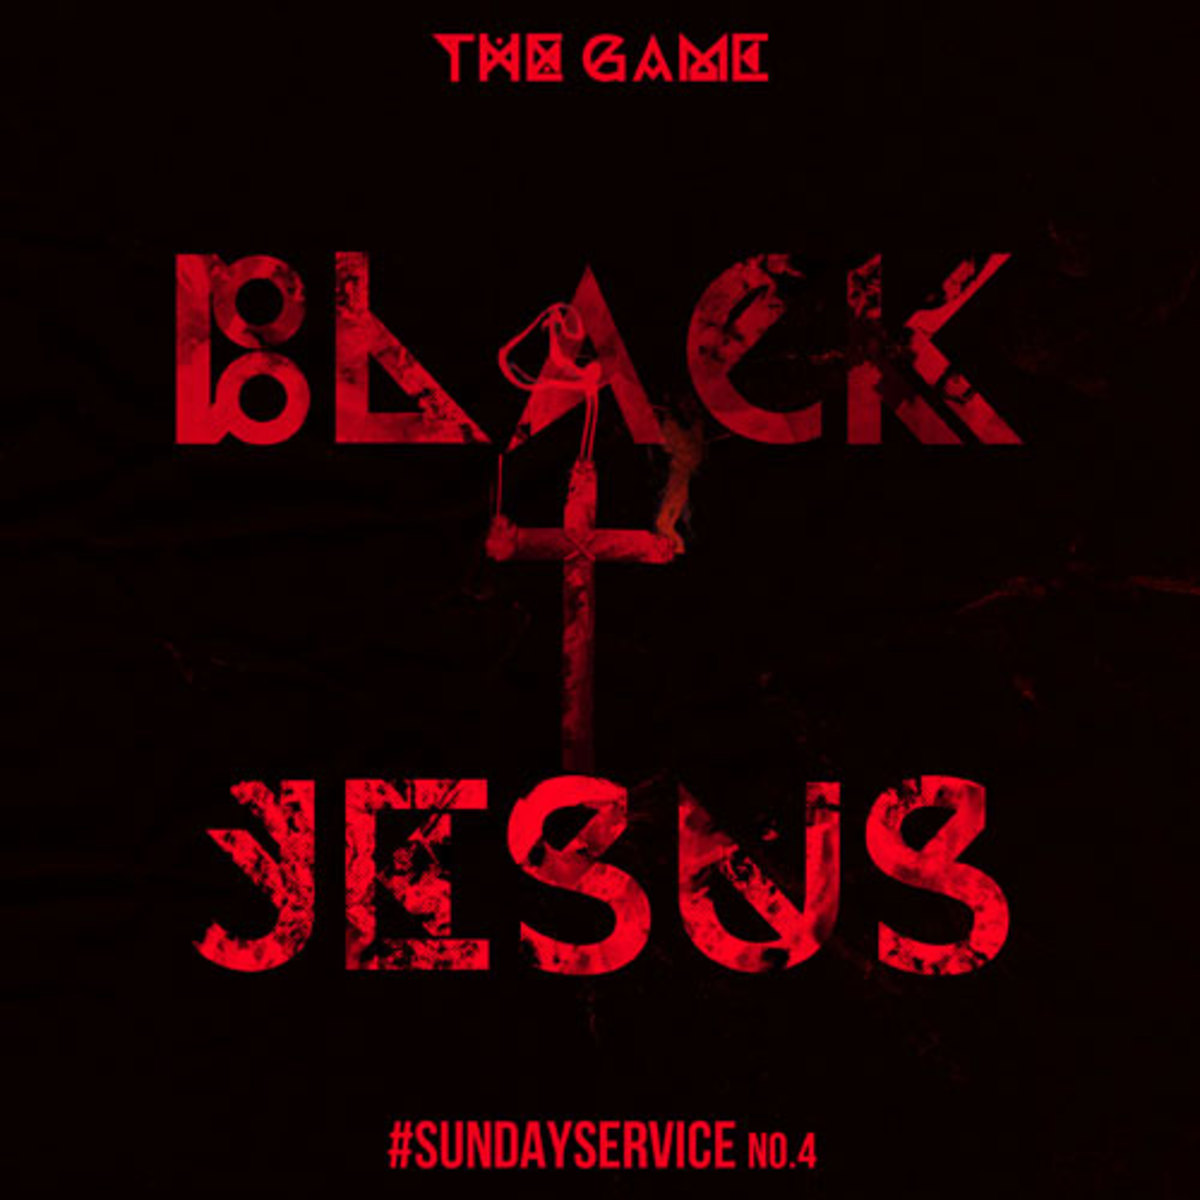 game-blackjesus.jpg